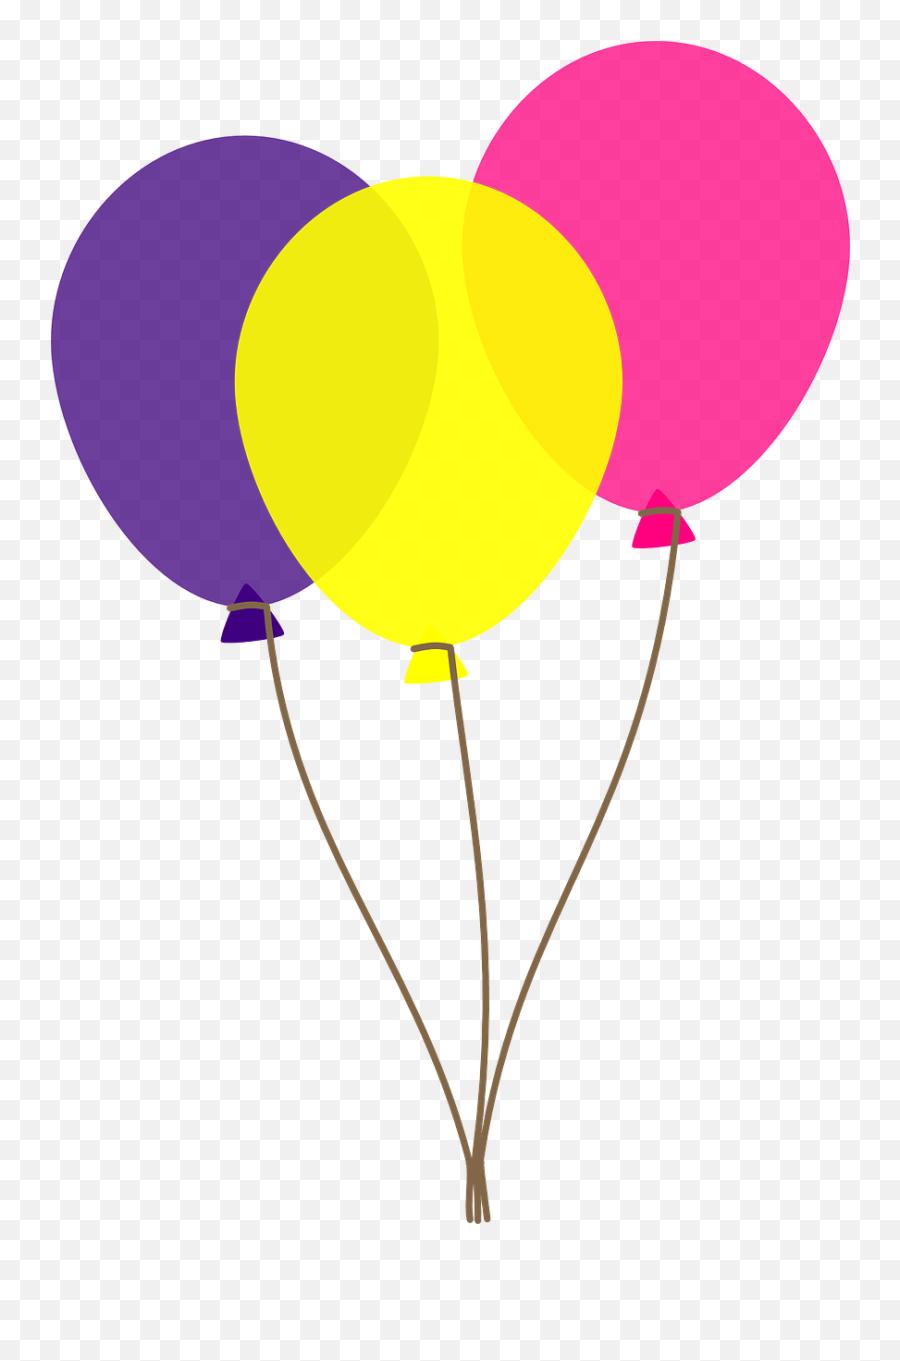 Free Birthday Balloons Clipart 6 - Balloon Clipart Transparent Background Emoji